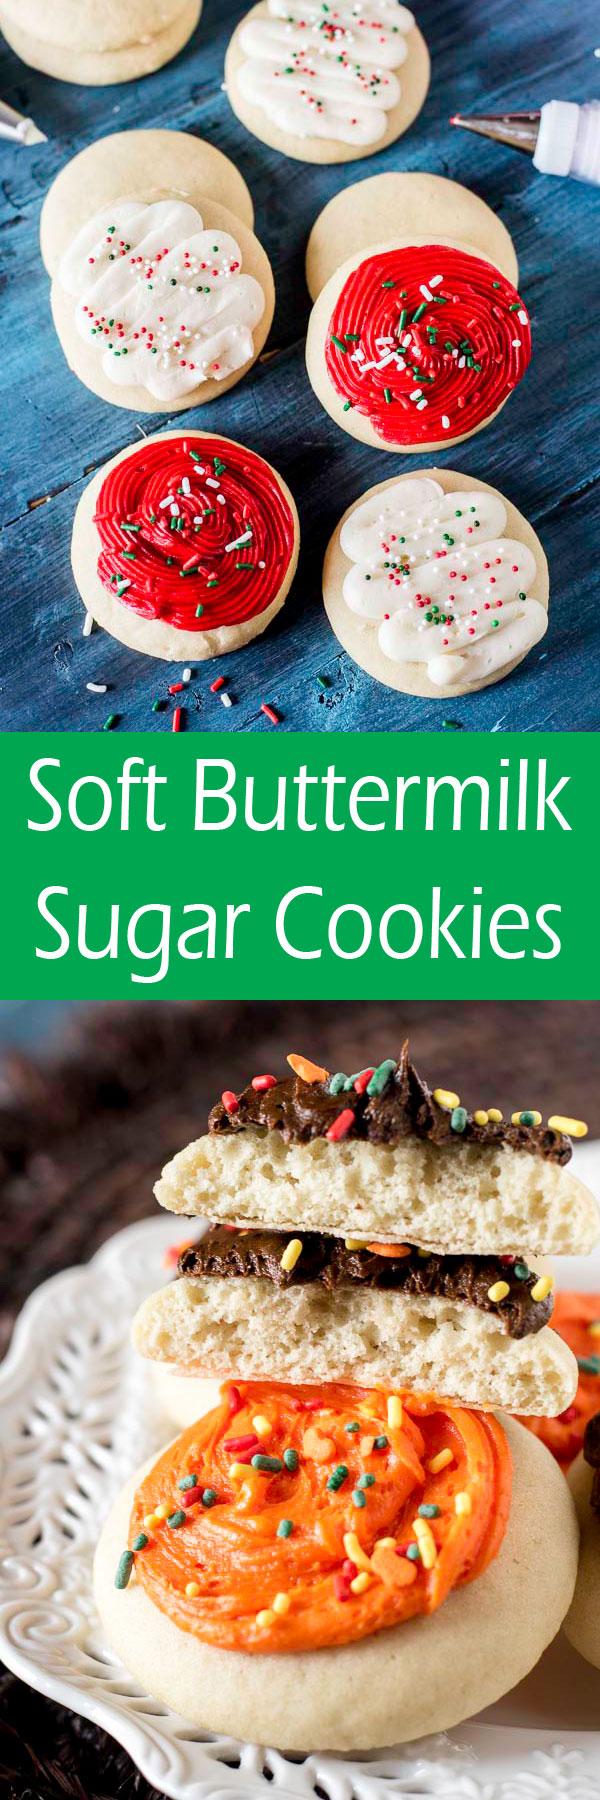 Soft Buttermilk Sugar Cookies Buttermilk Recipes Homemade Cookies Sugar Cookies